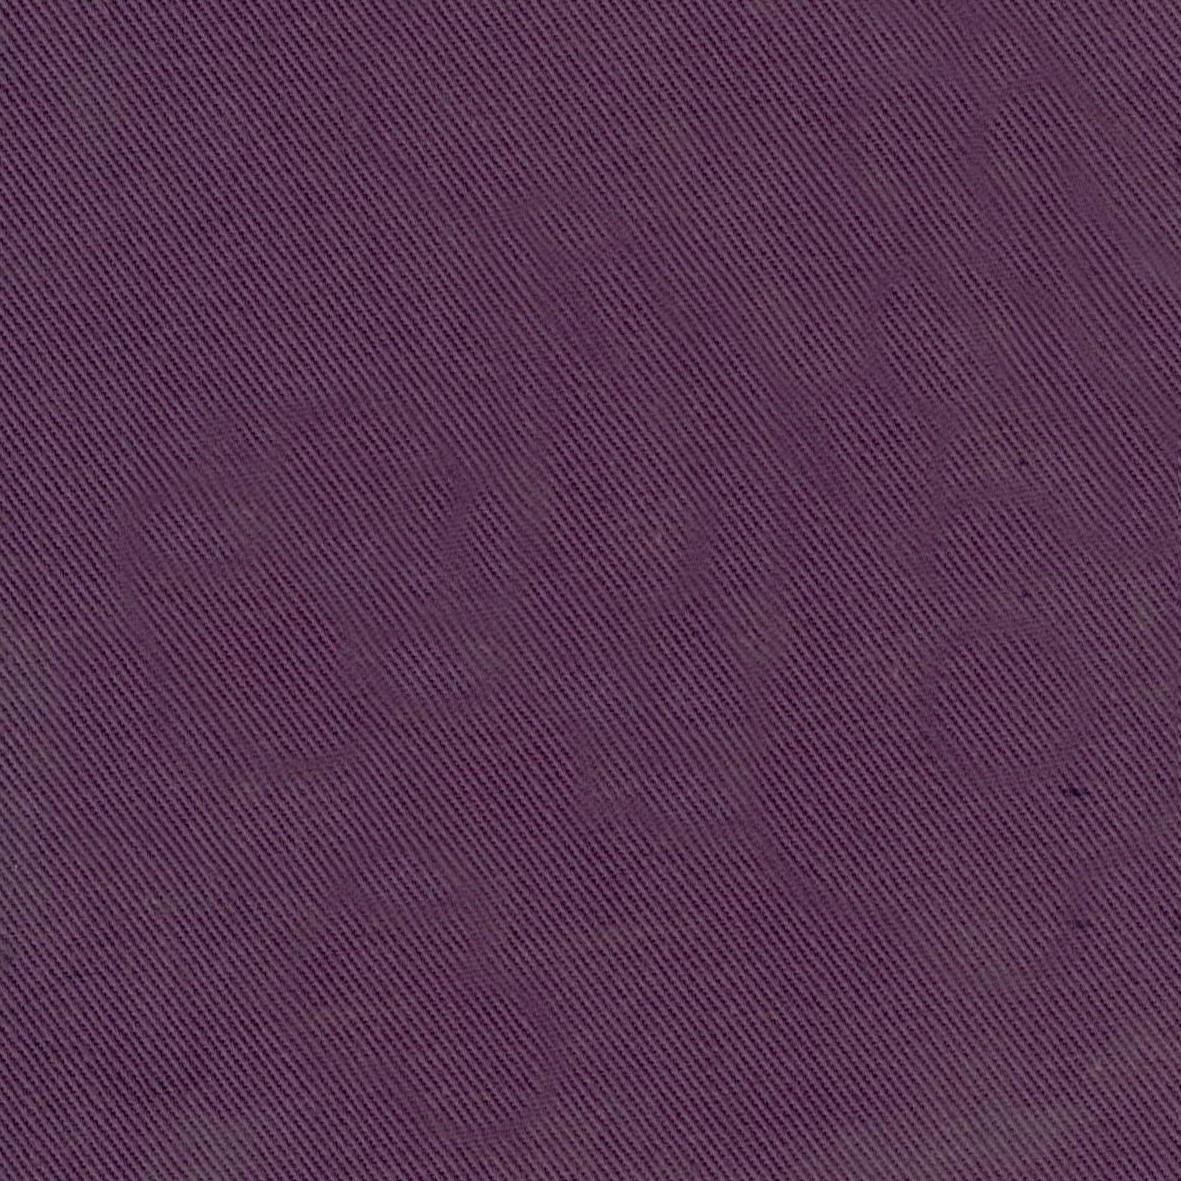 936-Purpurowy